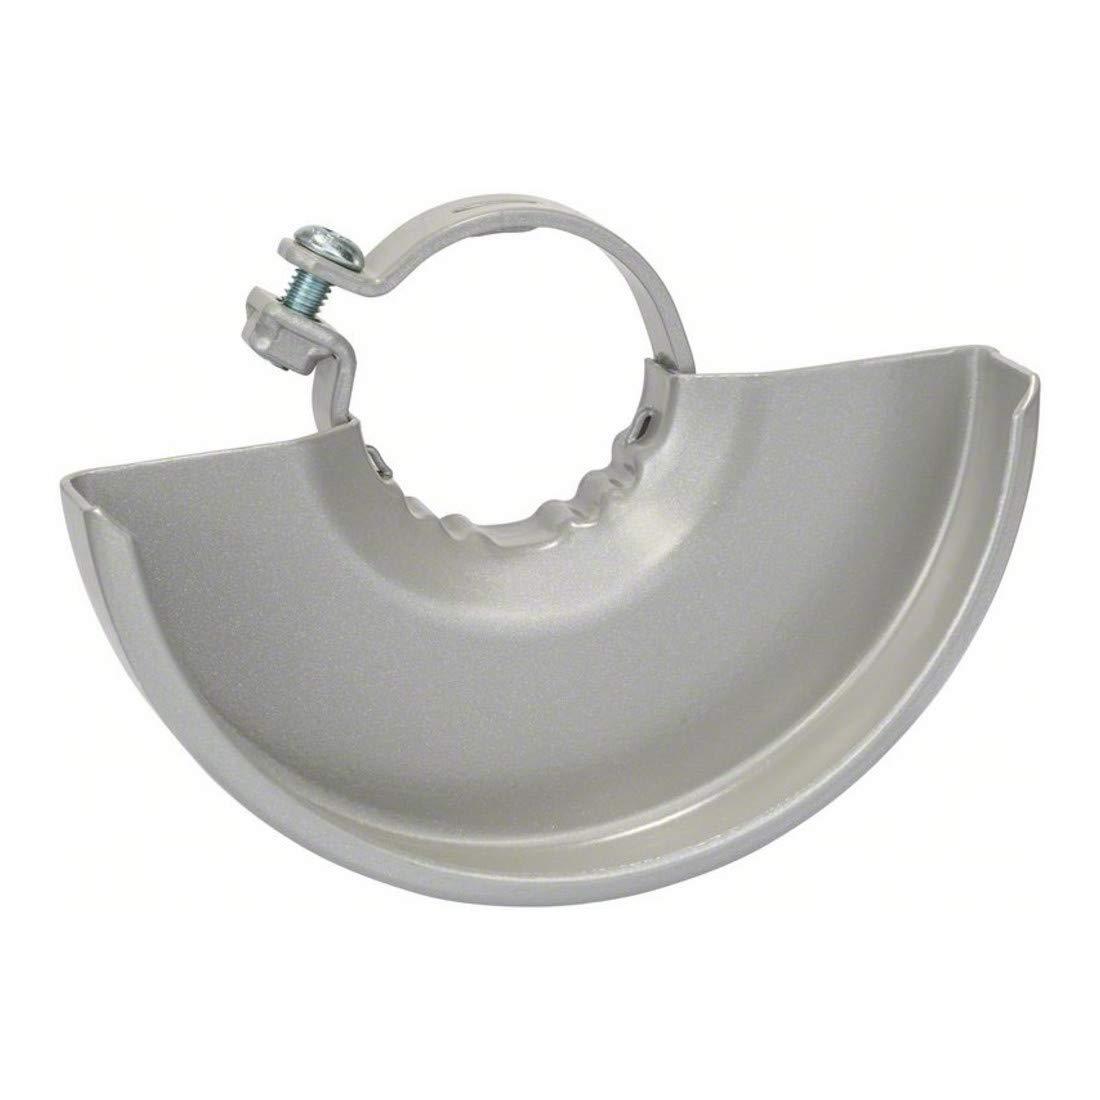 Bosch 1619P06547 Protective Guard, Silver, 115 mm